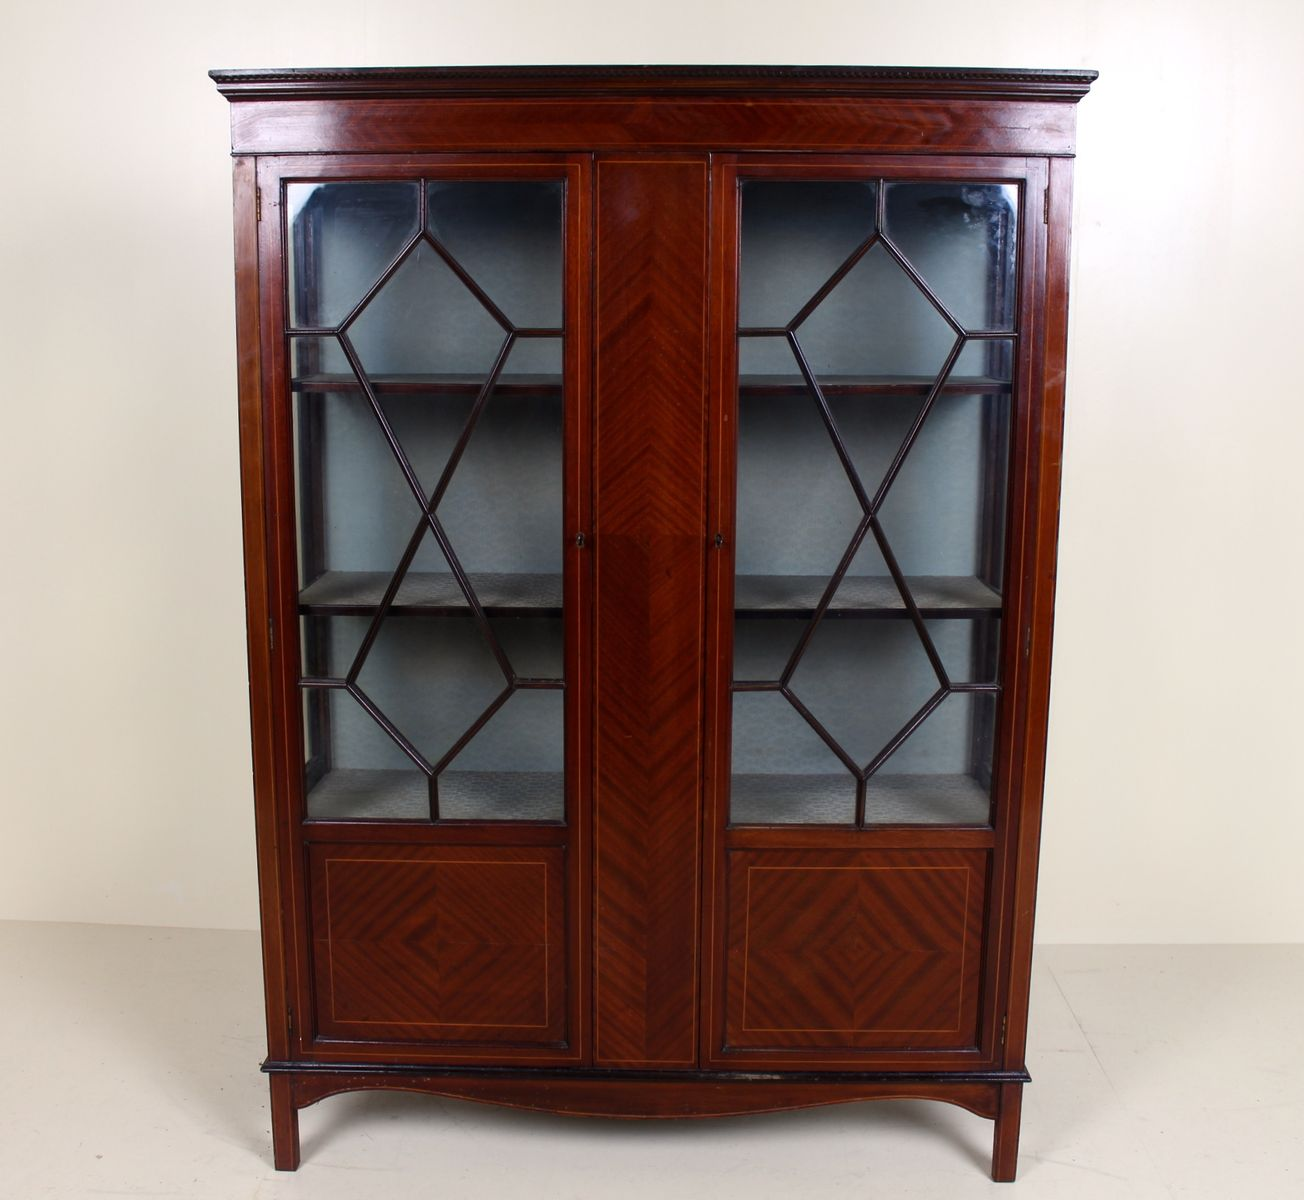 Antike Astragal Glasvitrine aus Mahagoni-Intarsien   Wohnzimmer > Vitrinen > Glasvitrinen   Braun   Mahagoni